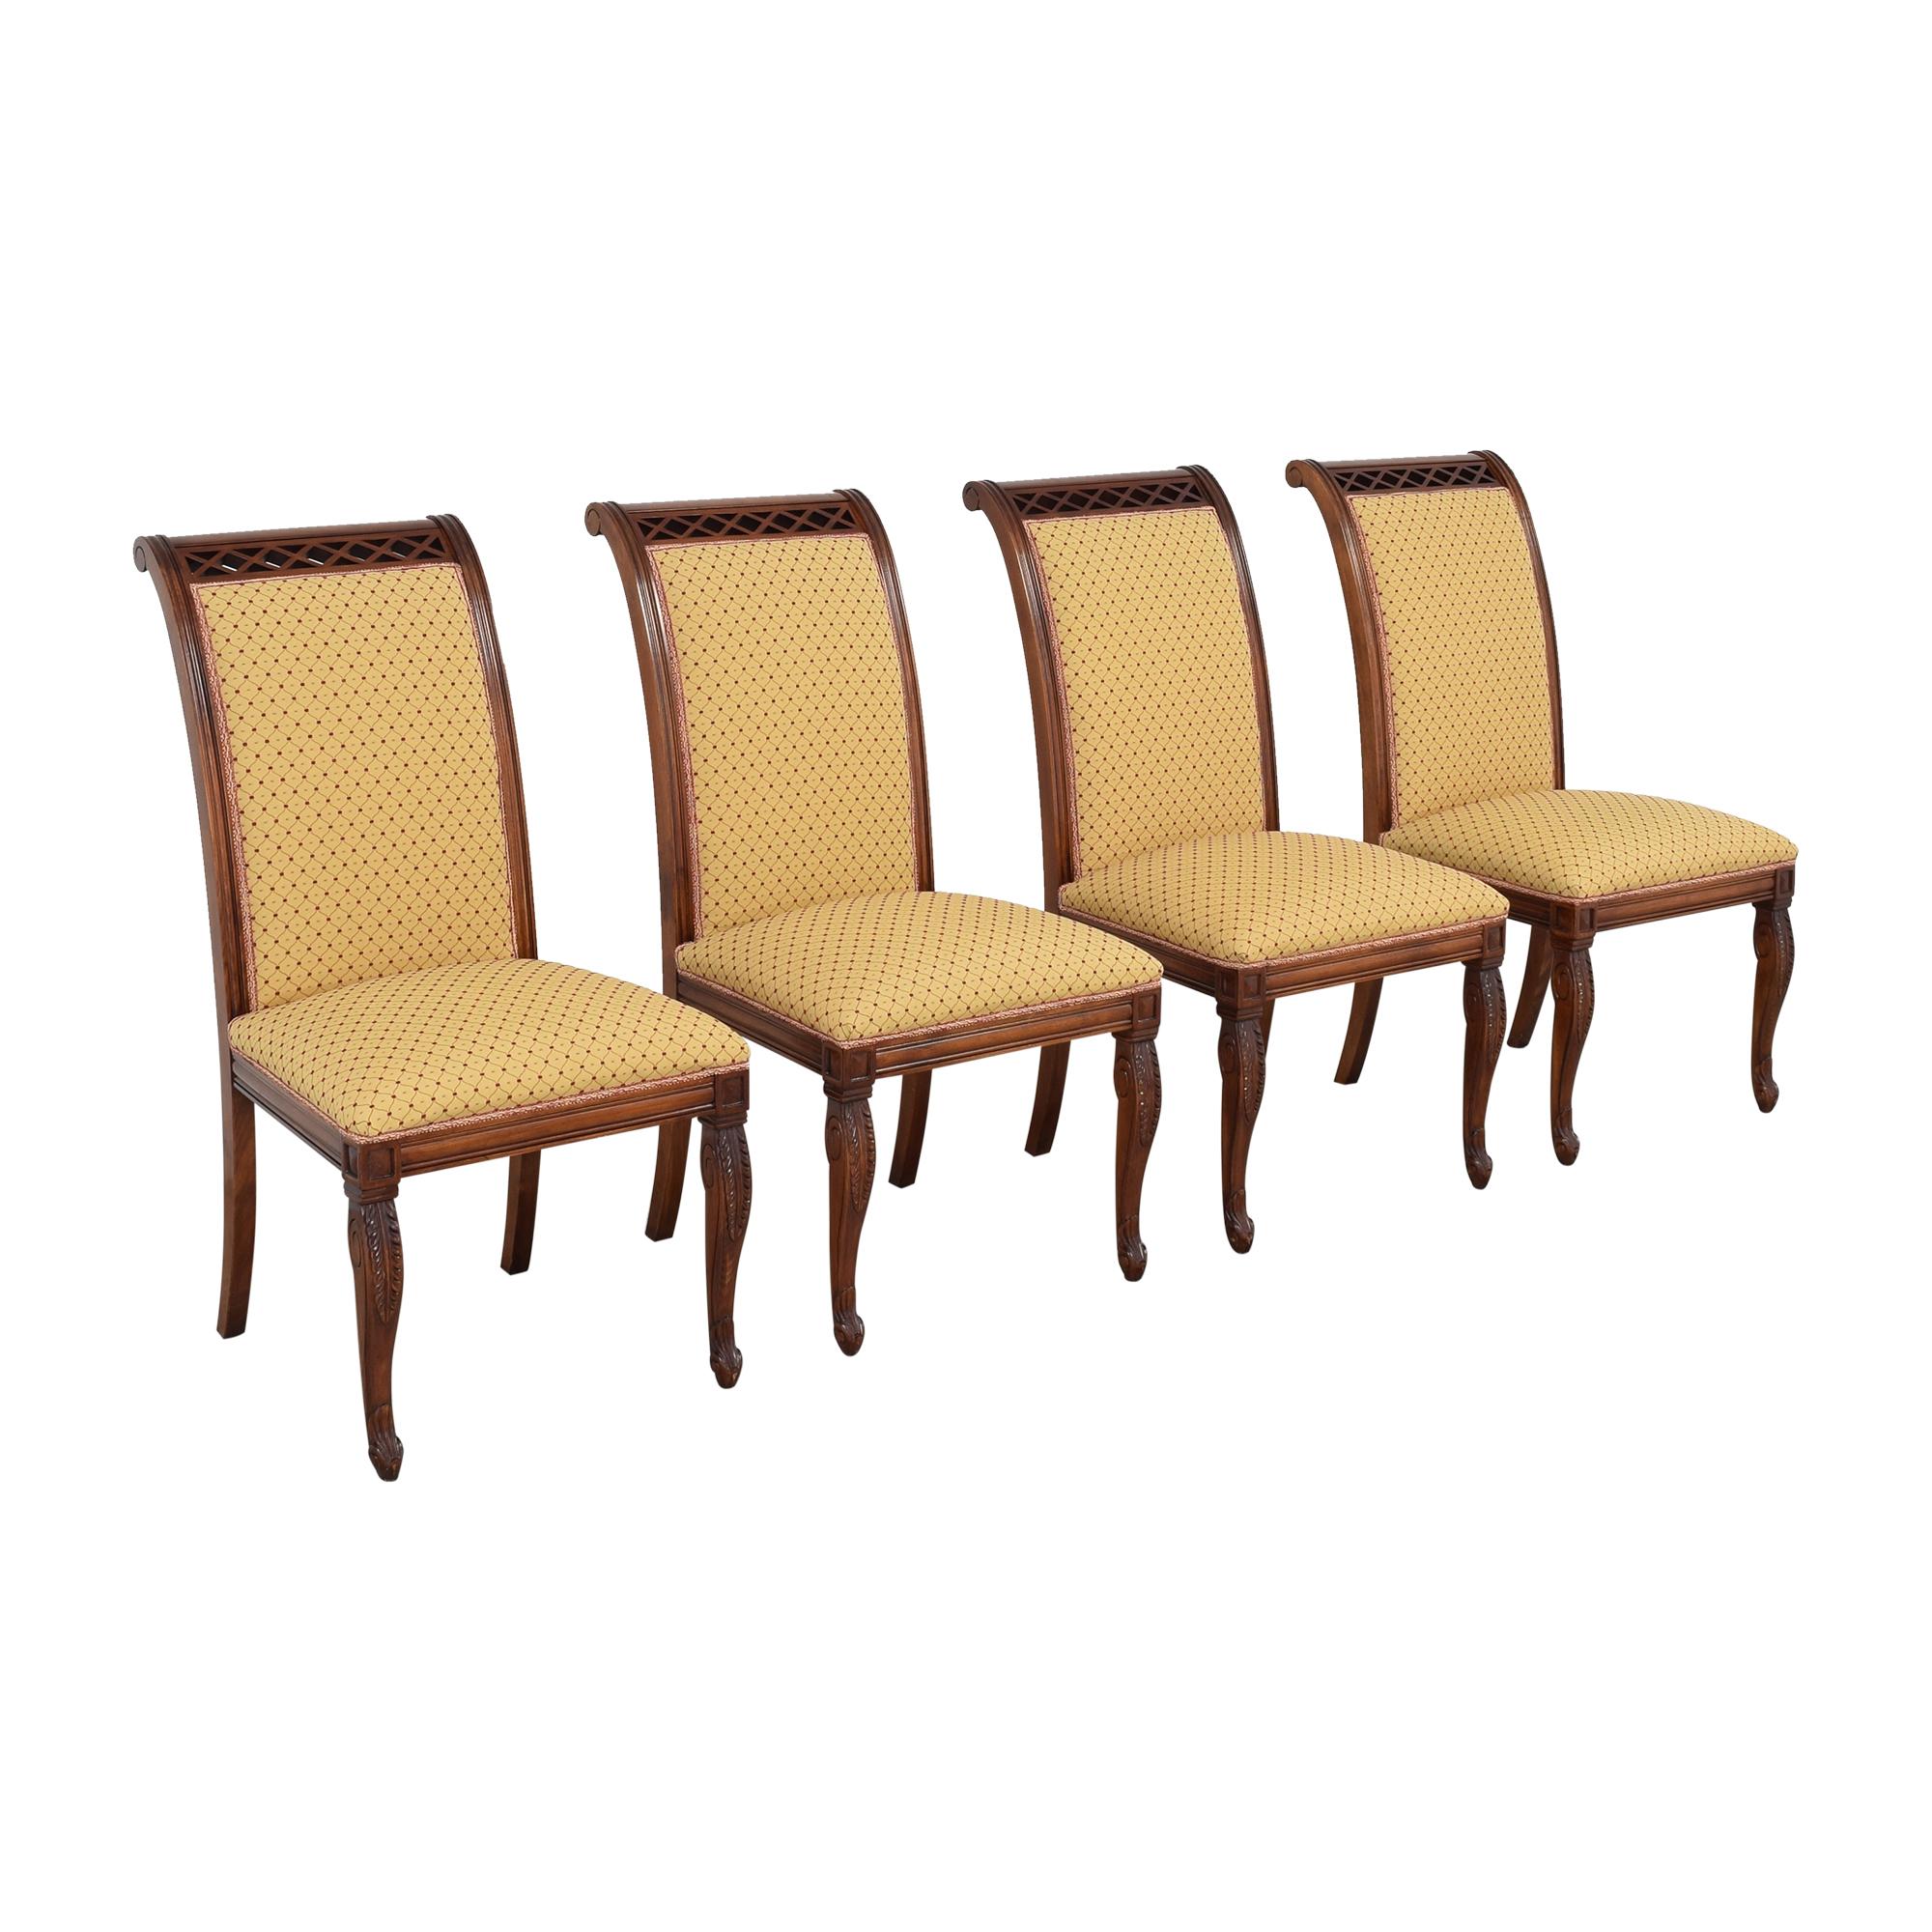 KPS Furnishings KPS Furnishings Custom Dining Chairs dimensions